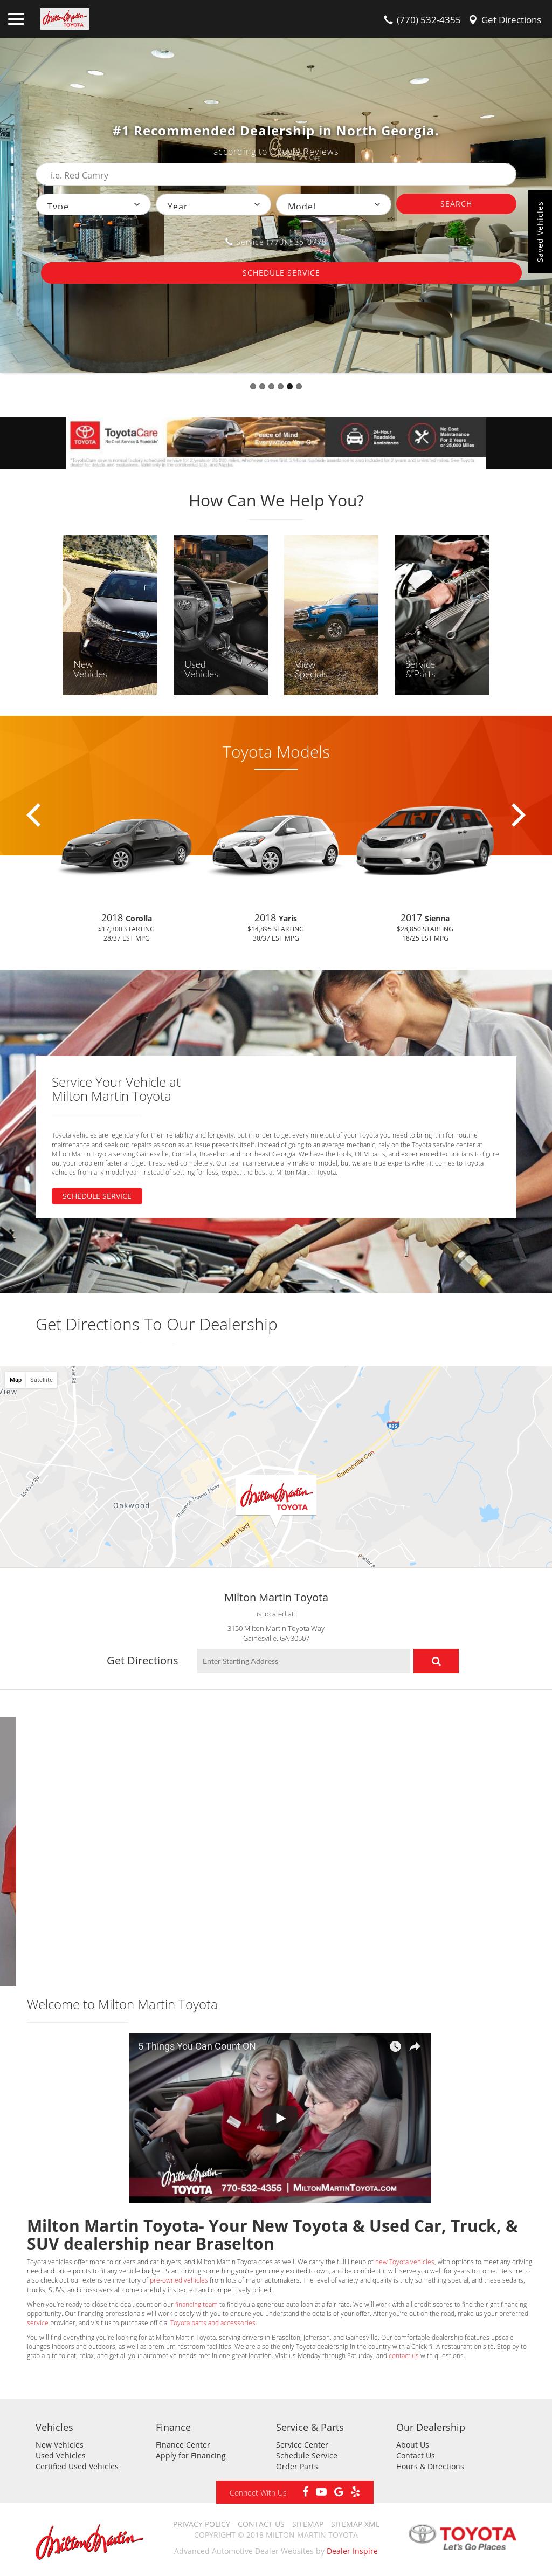 Milton Martin Toyota Website History